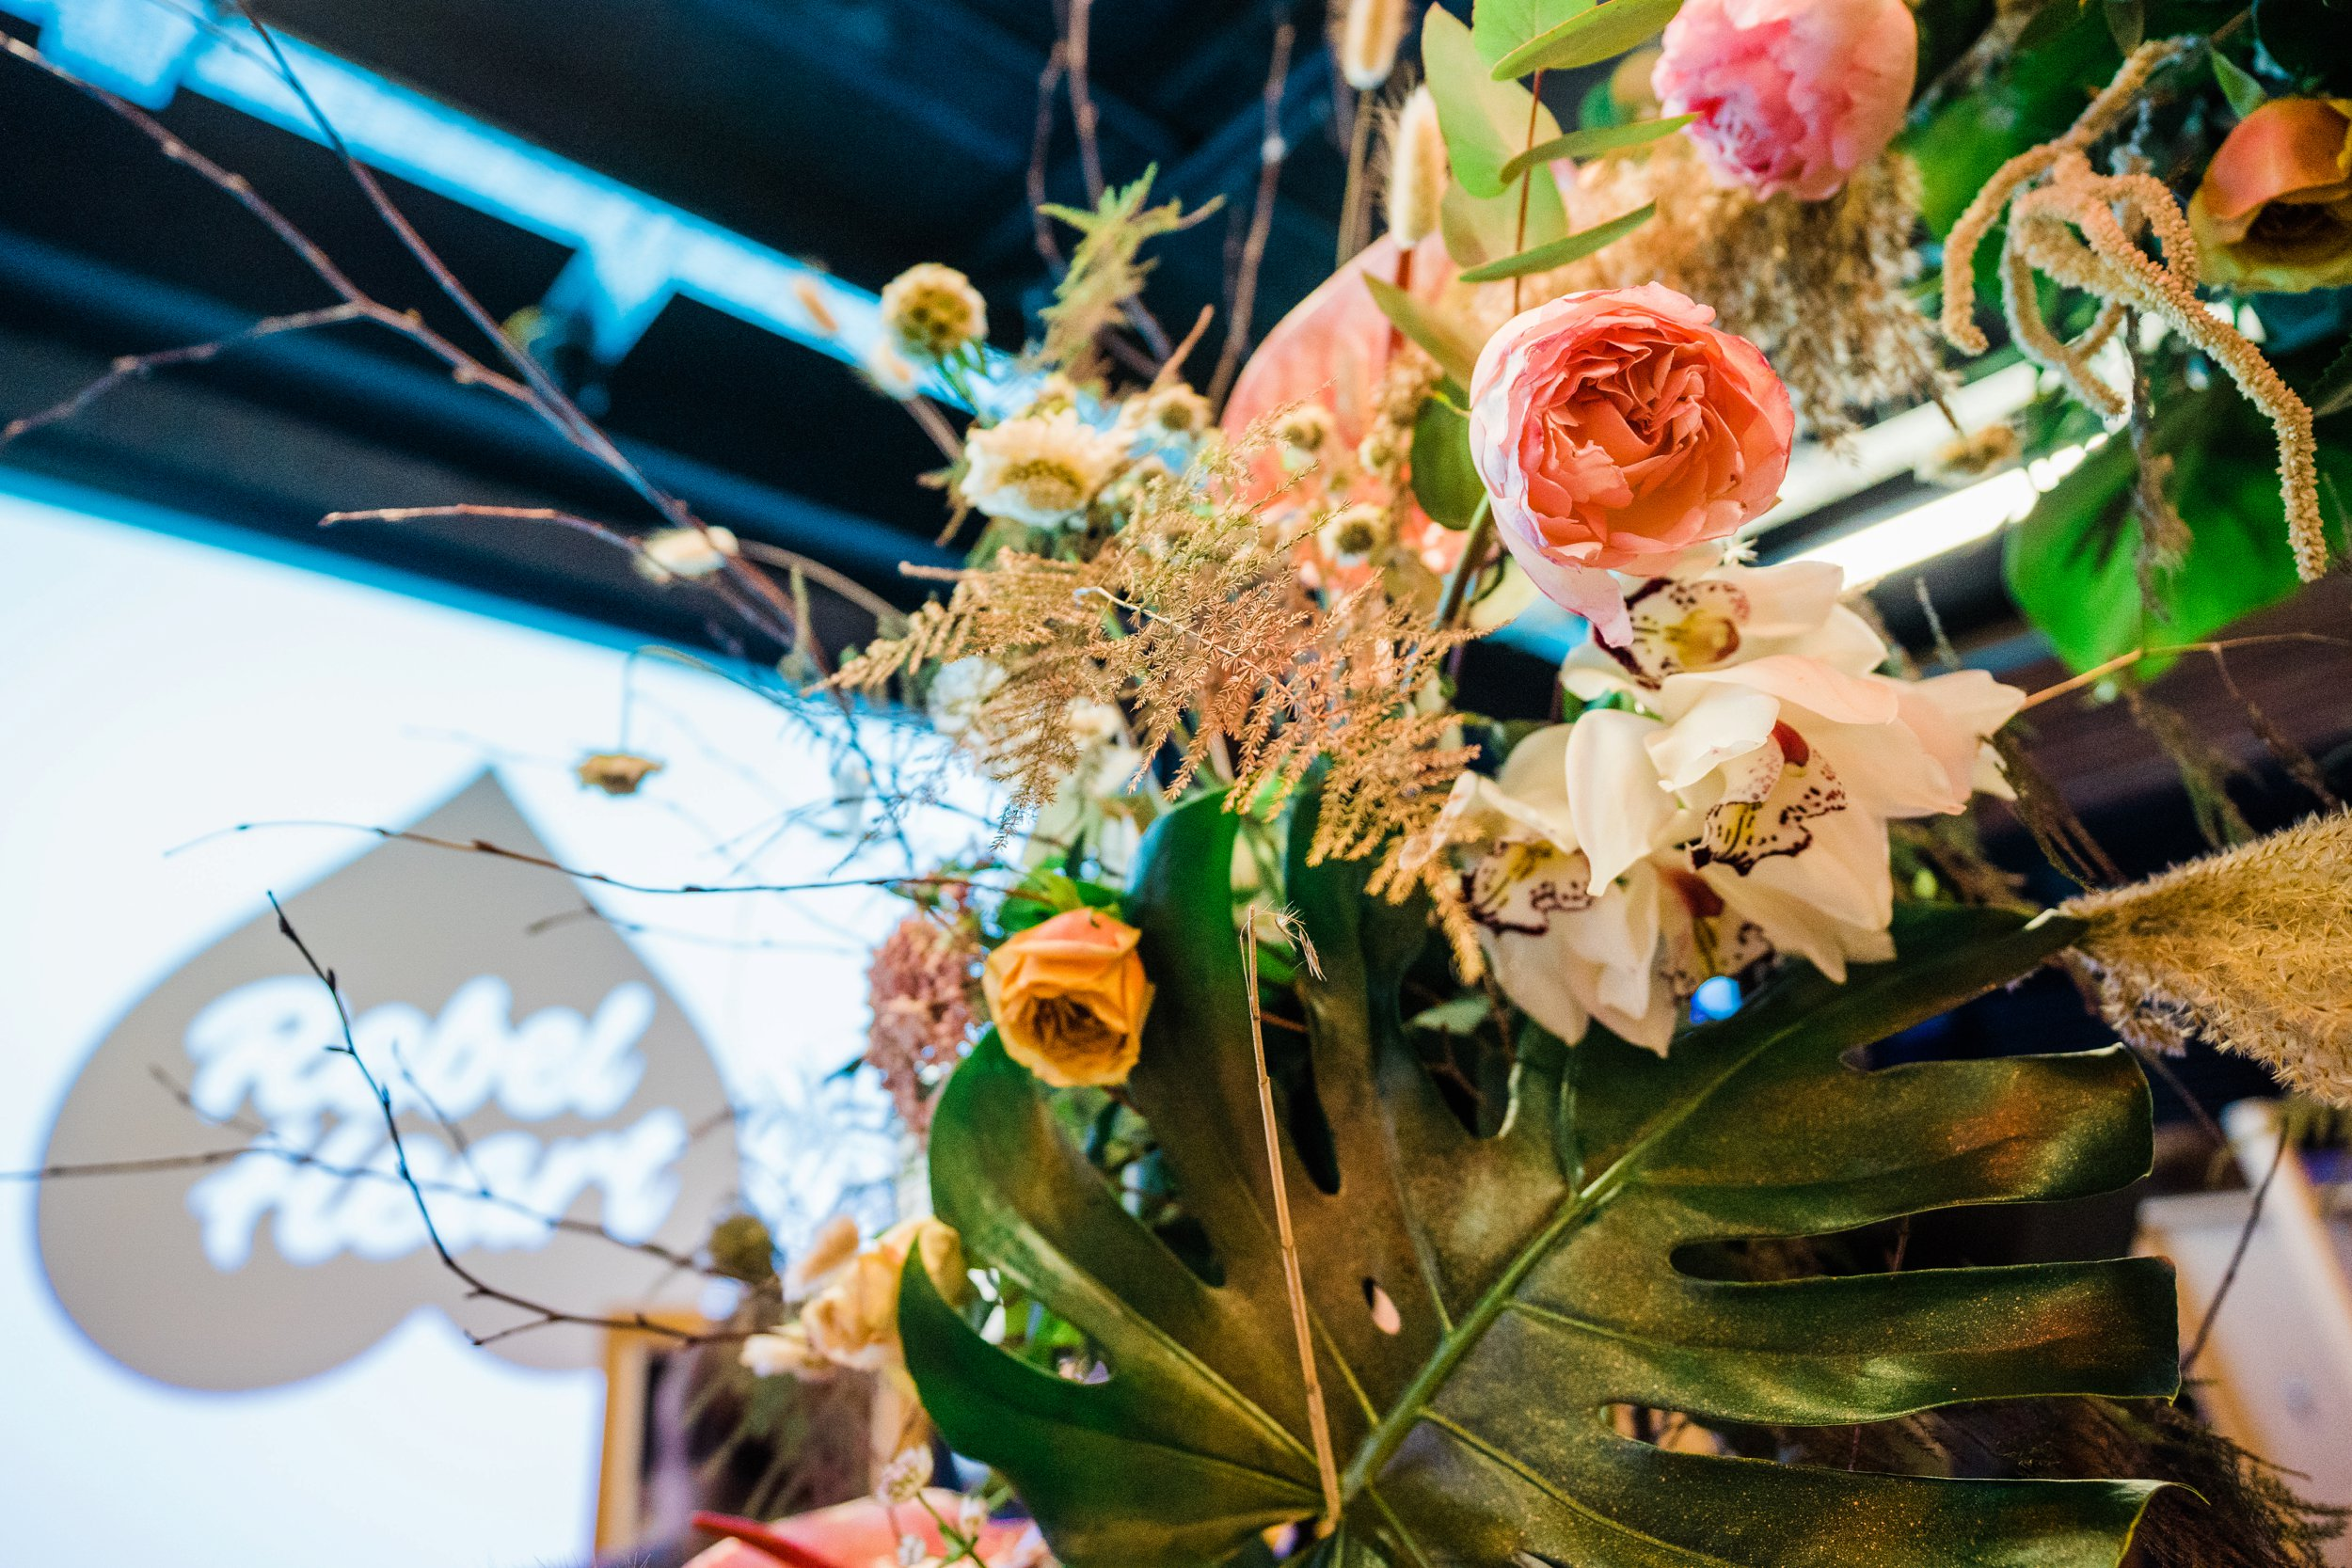 The UN-WEDDING SHOW 2019 cool bride style modern wedding fair Leeds Duke Studios 00019.jpg